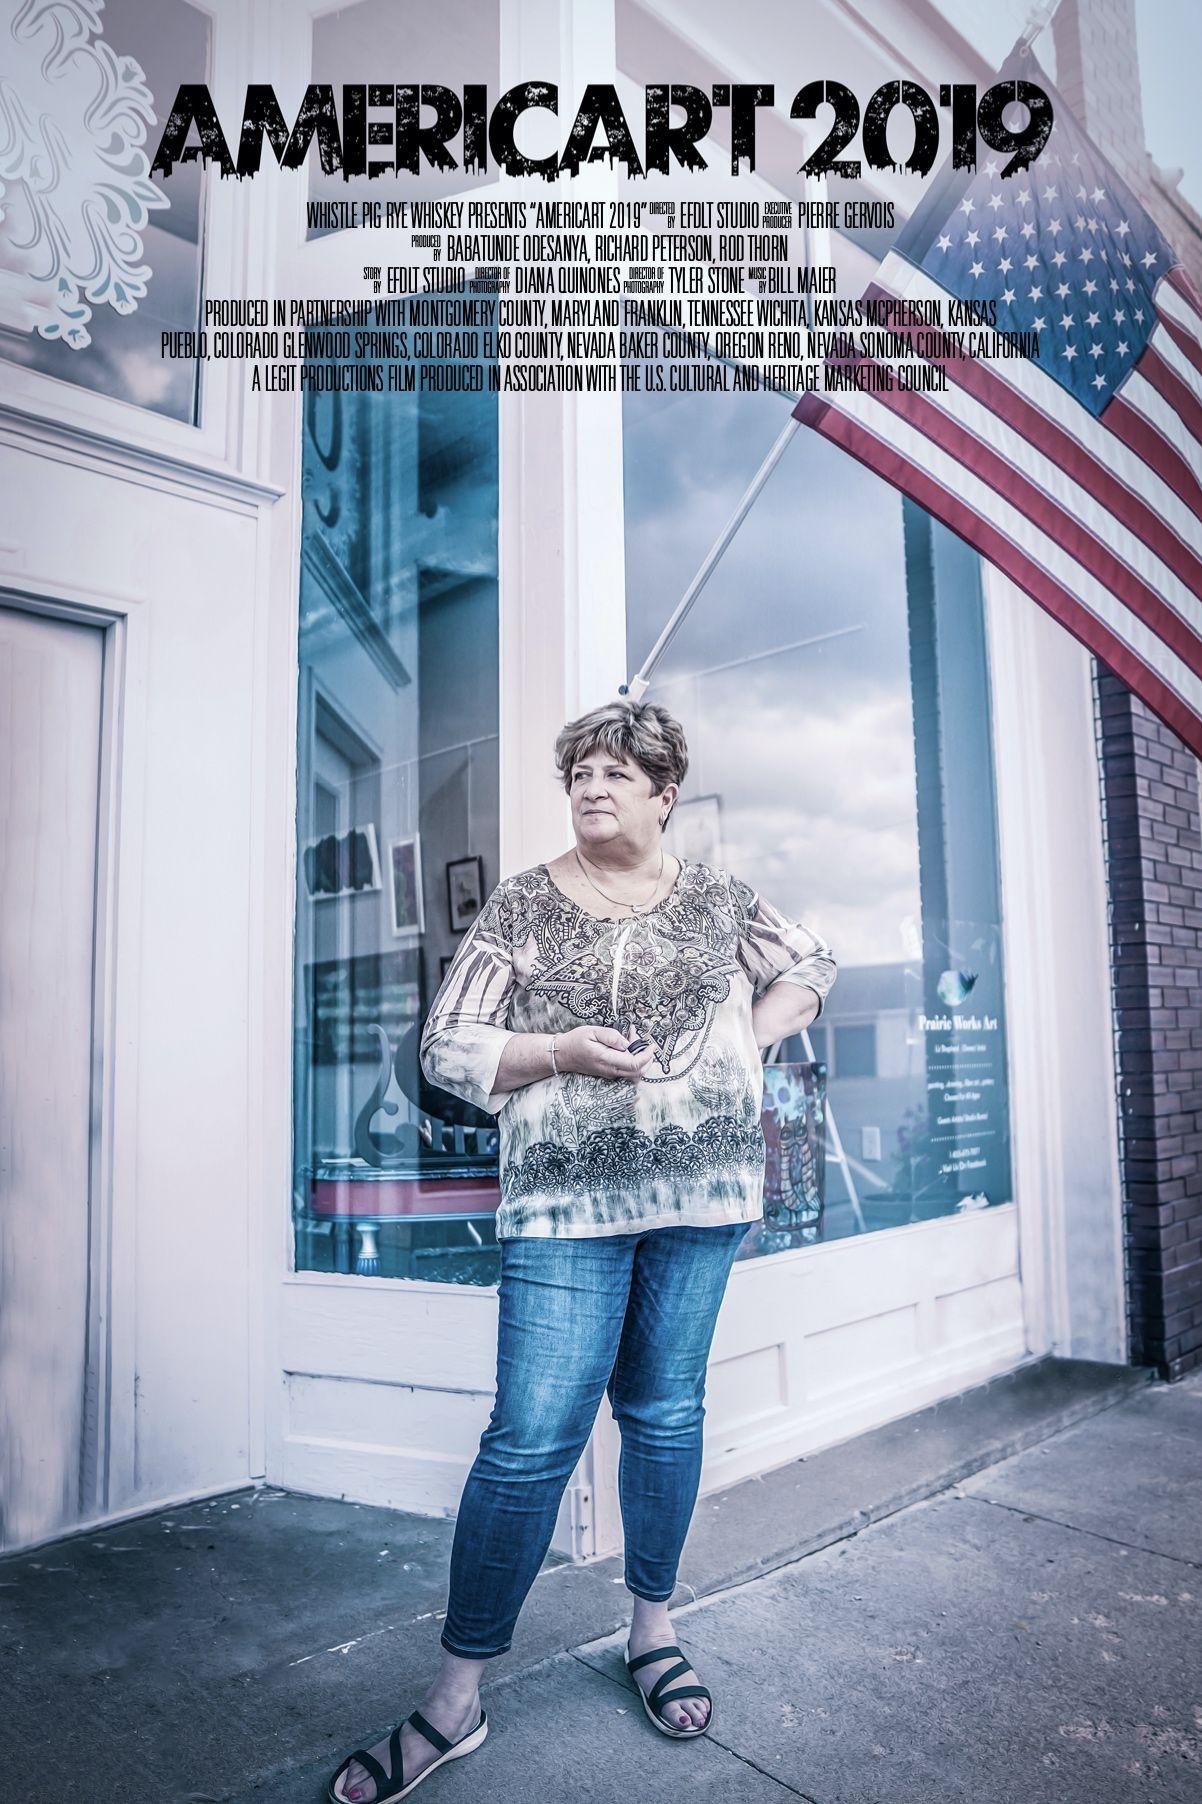 Americart 2019 Poster